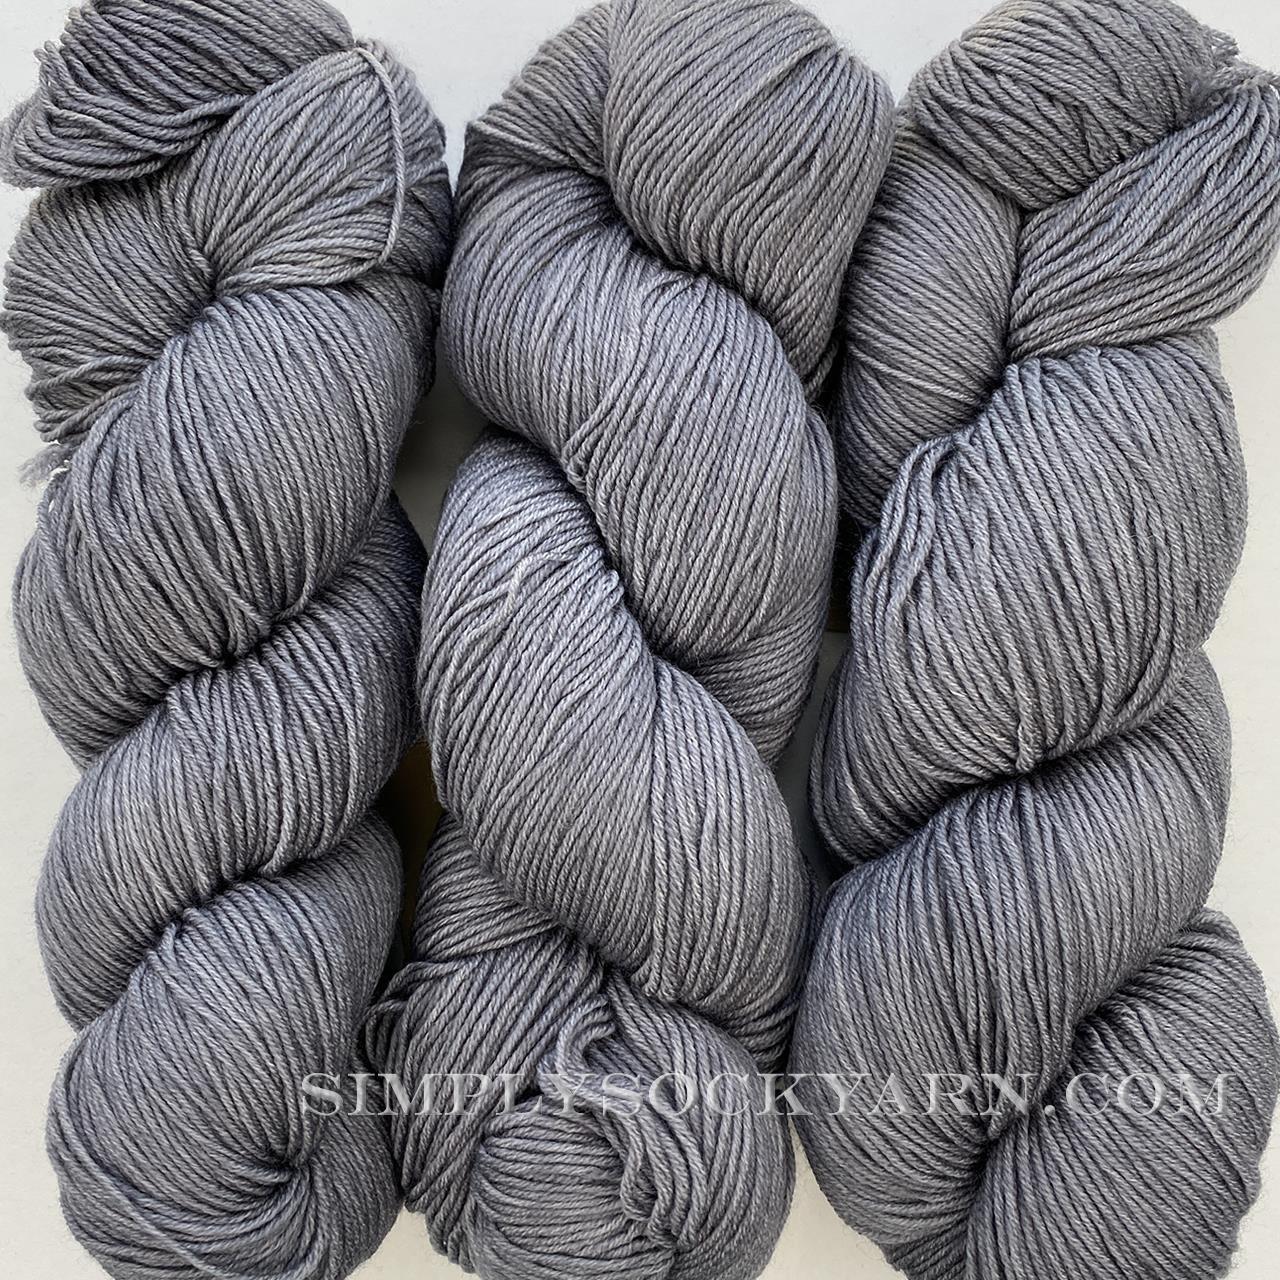 Urth Harvest Mint (gray) -